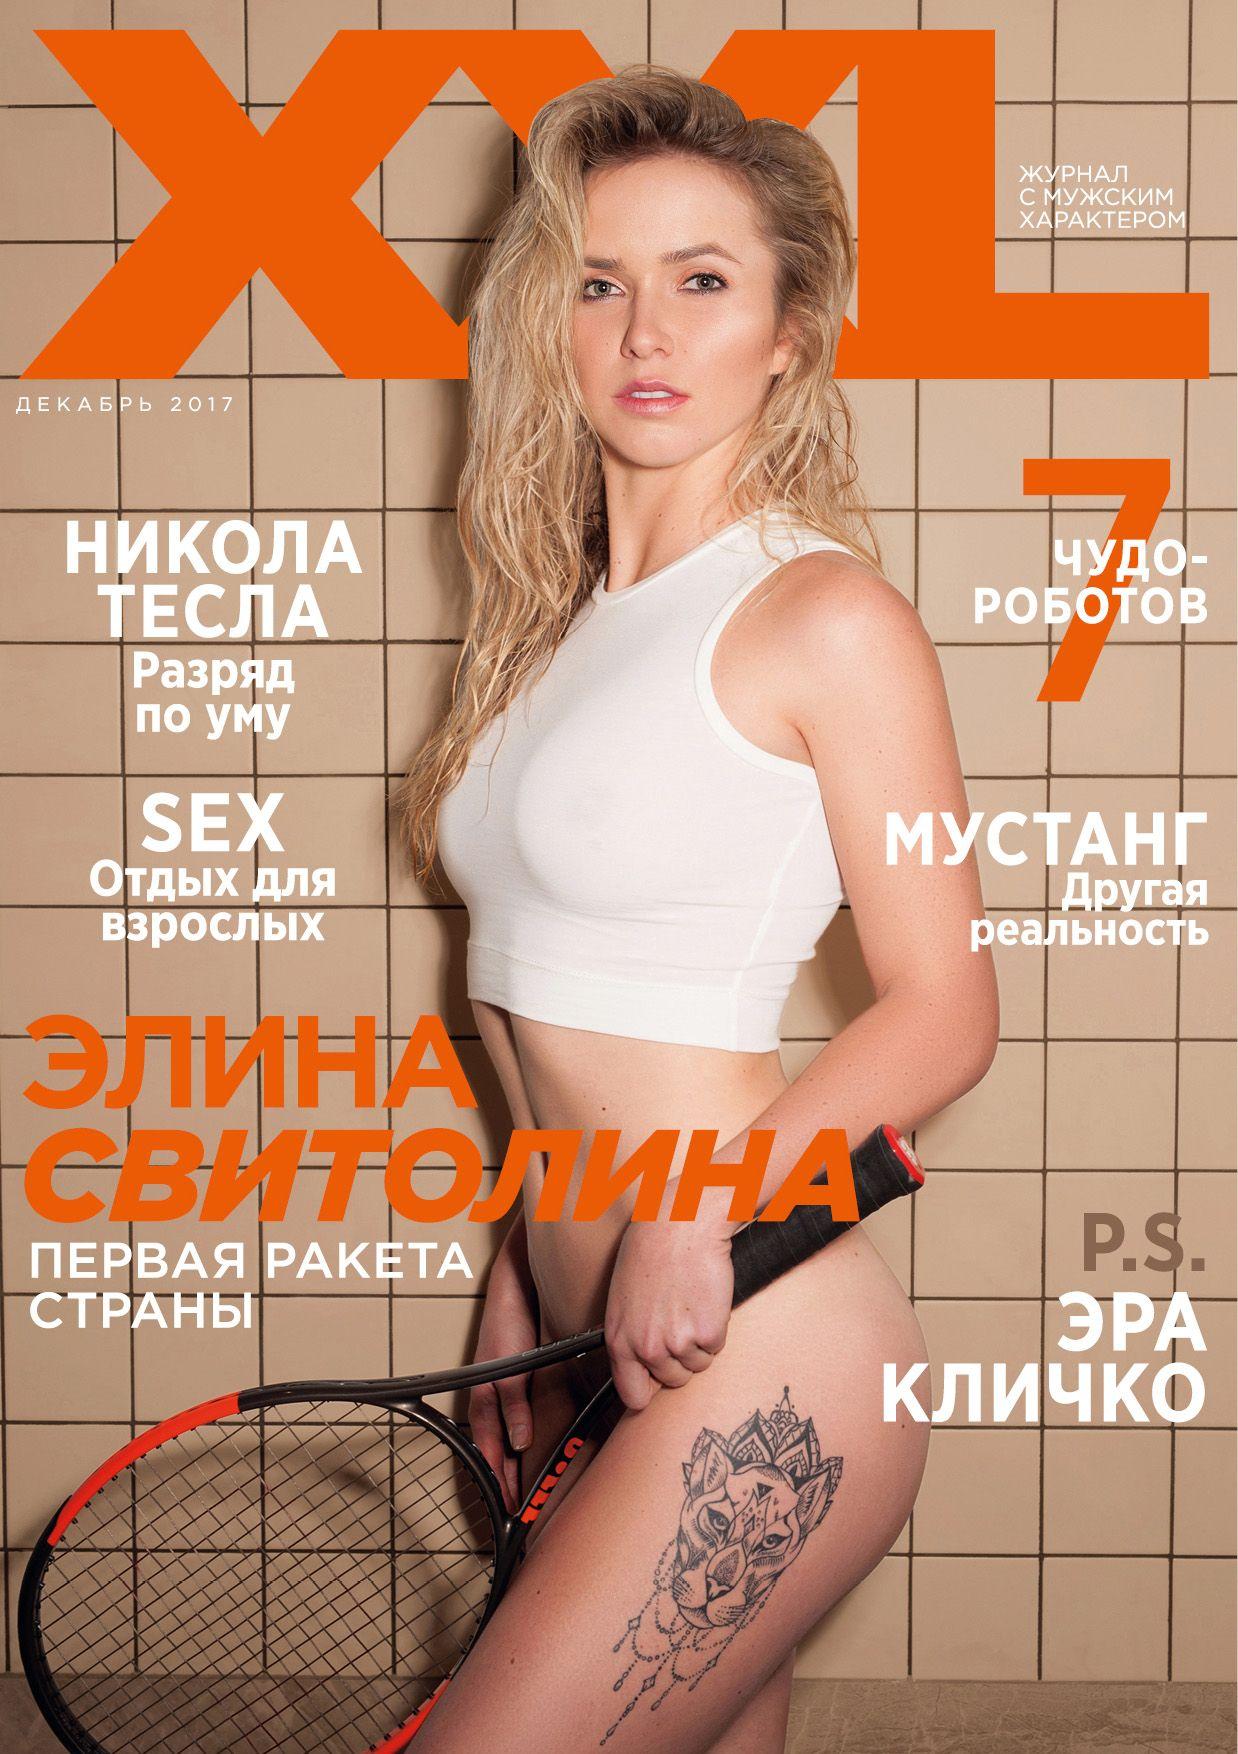 Elina-Svitolina-Sexy-Topless-9-thefappeningblog.com_.jpg